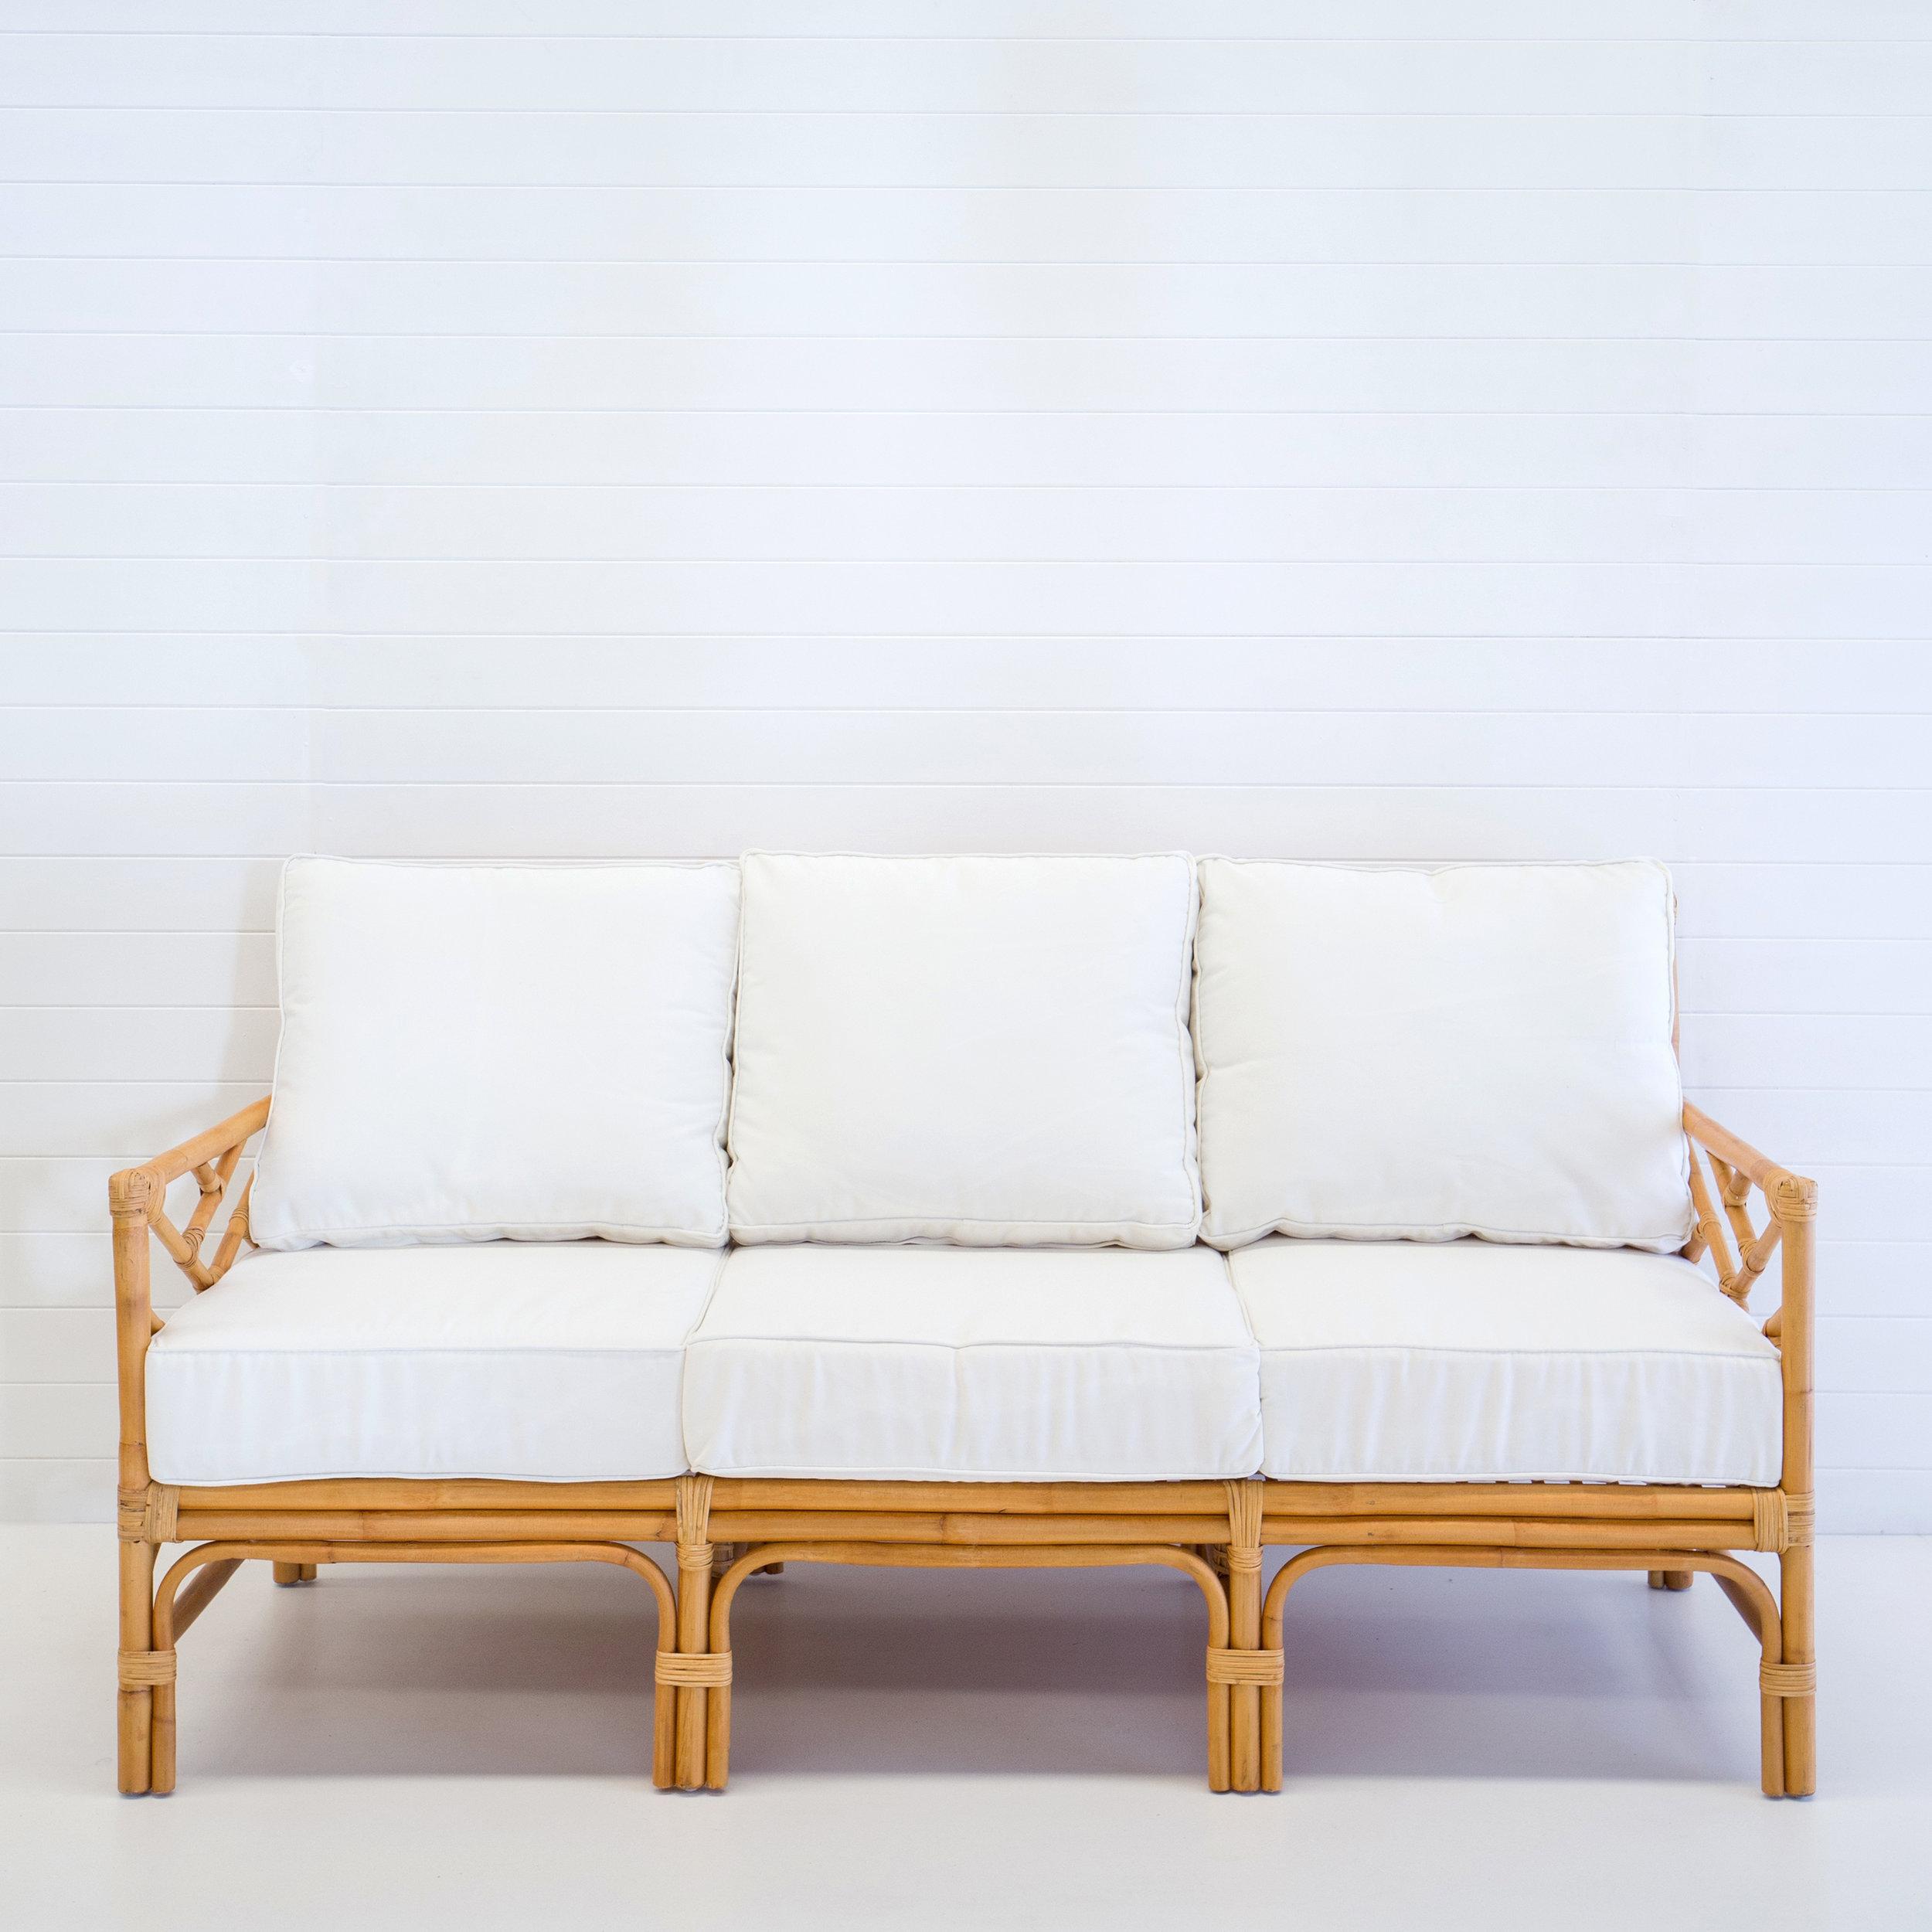 Hamptons natural 3-seater sofa (with white cushions)